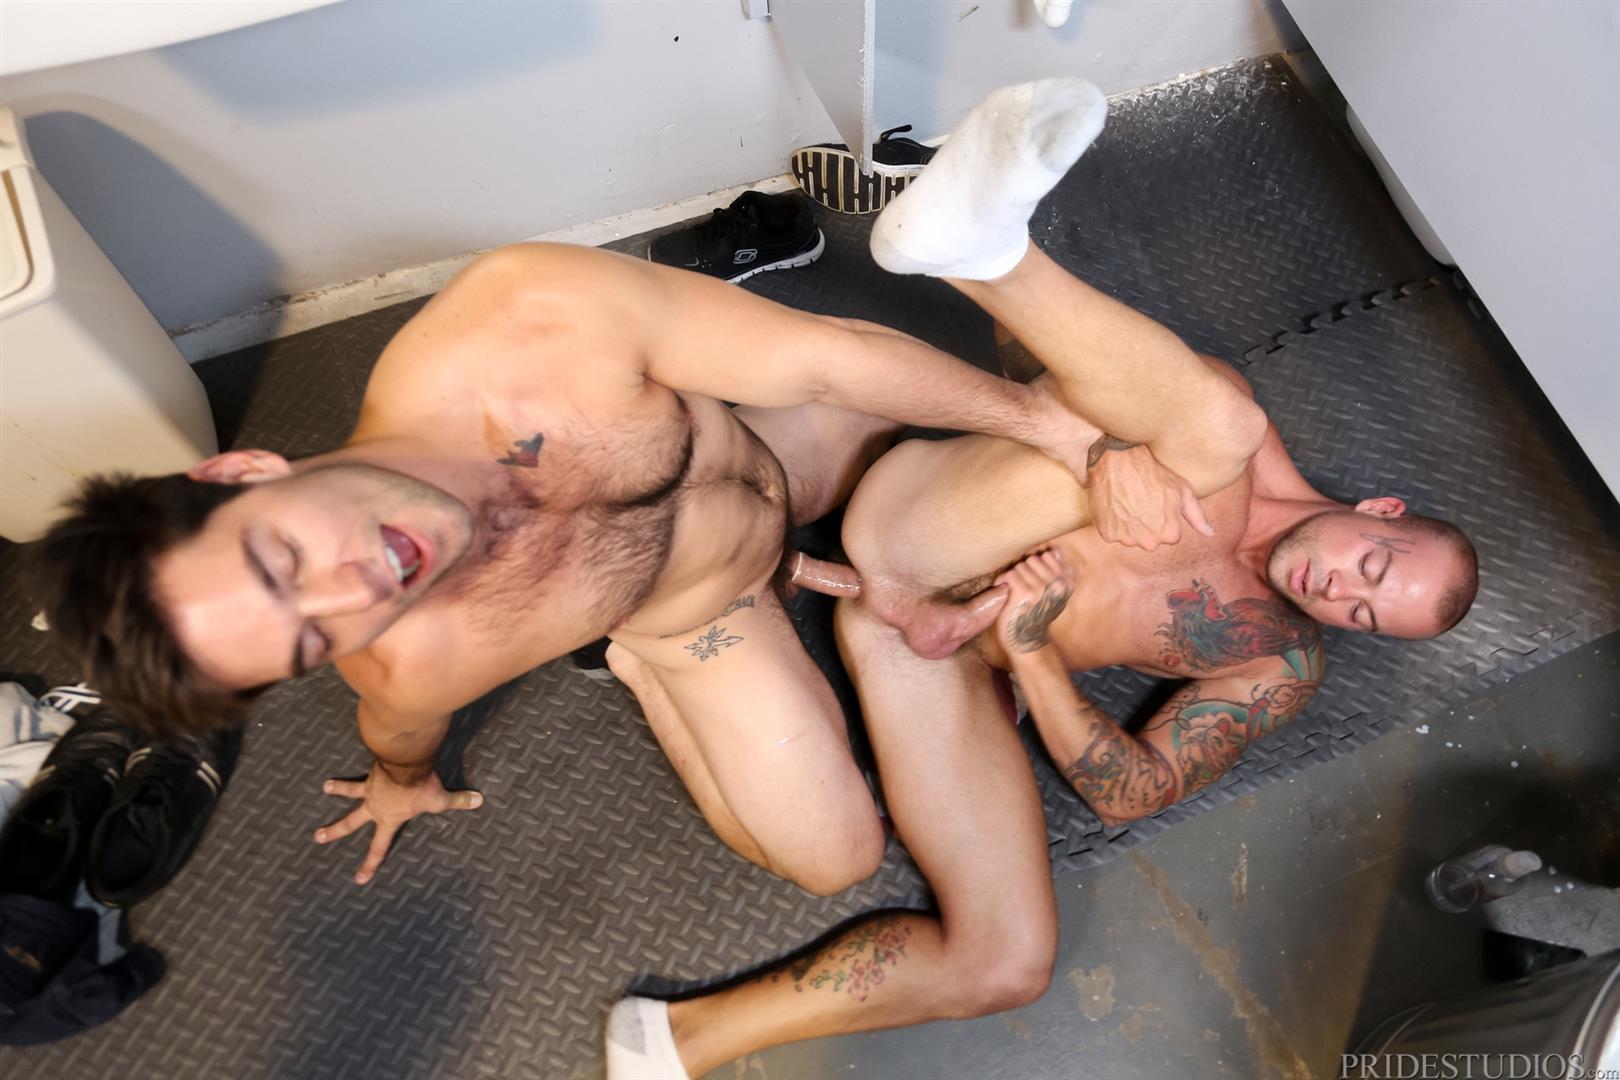 Extra-Big-Dicks-Sean-Duran-Fucking-Through-A-Glory-Hole-Amateur-Gay-Porn-15 Getting Fucked By A Big Fat Cock Through a Glory Hole